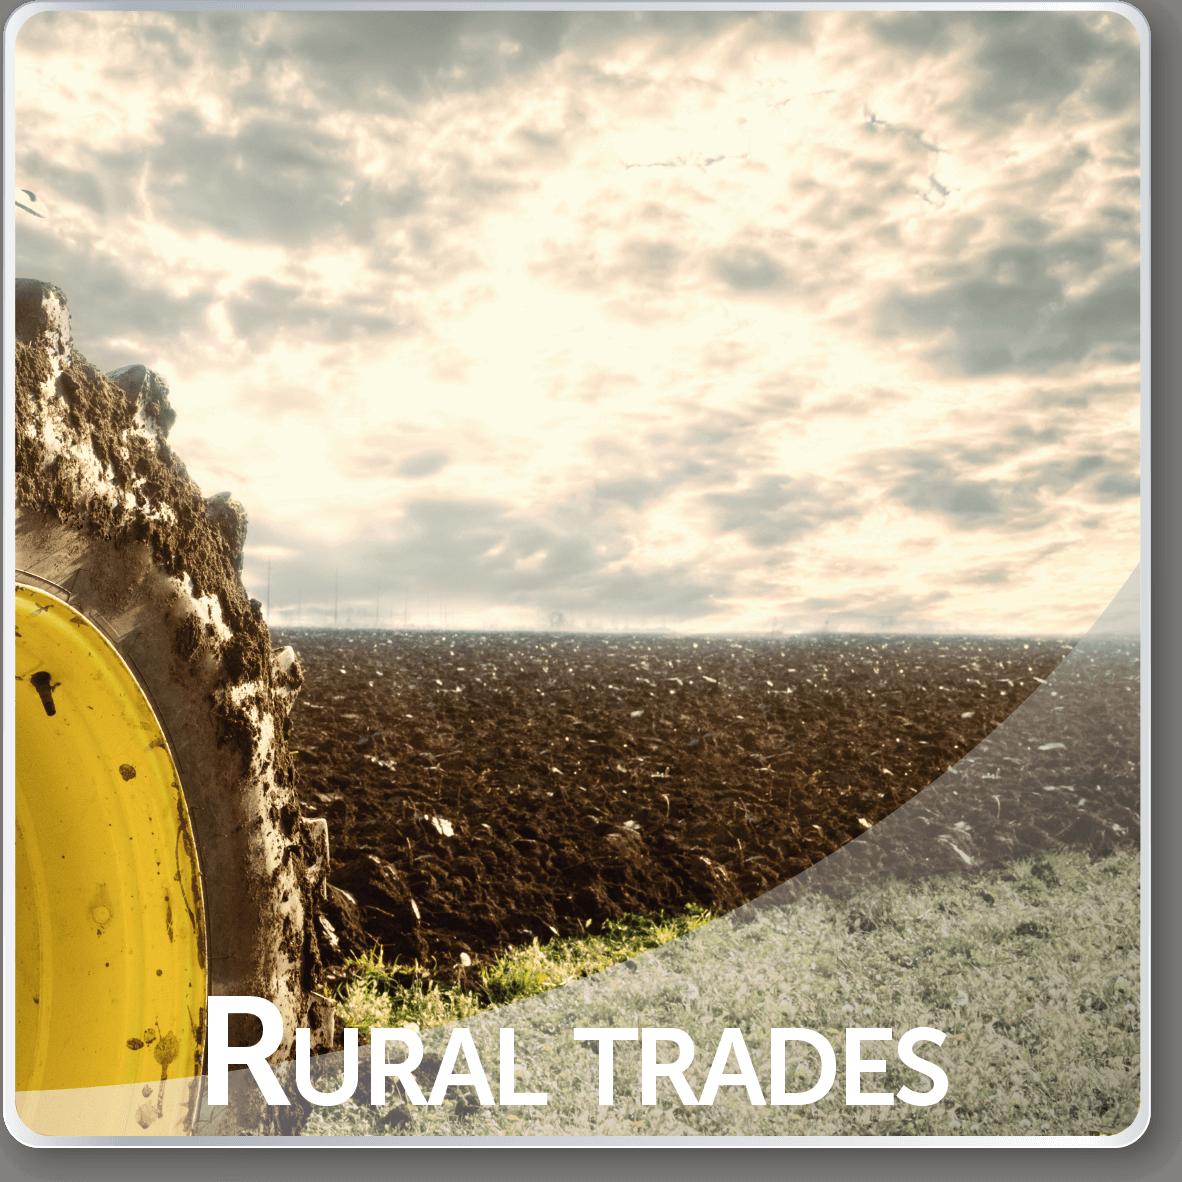 rural trades